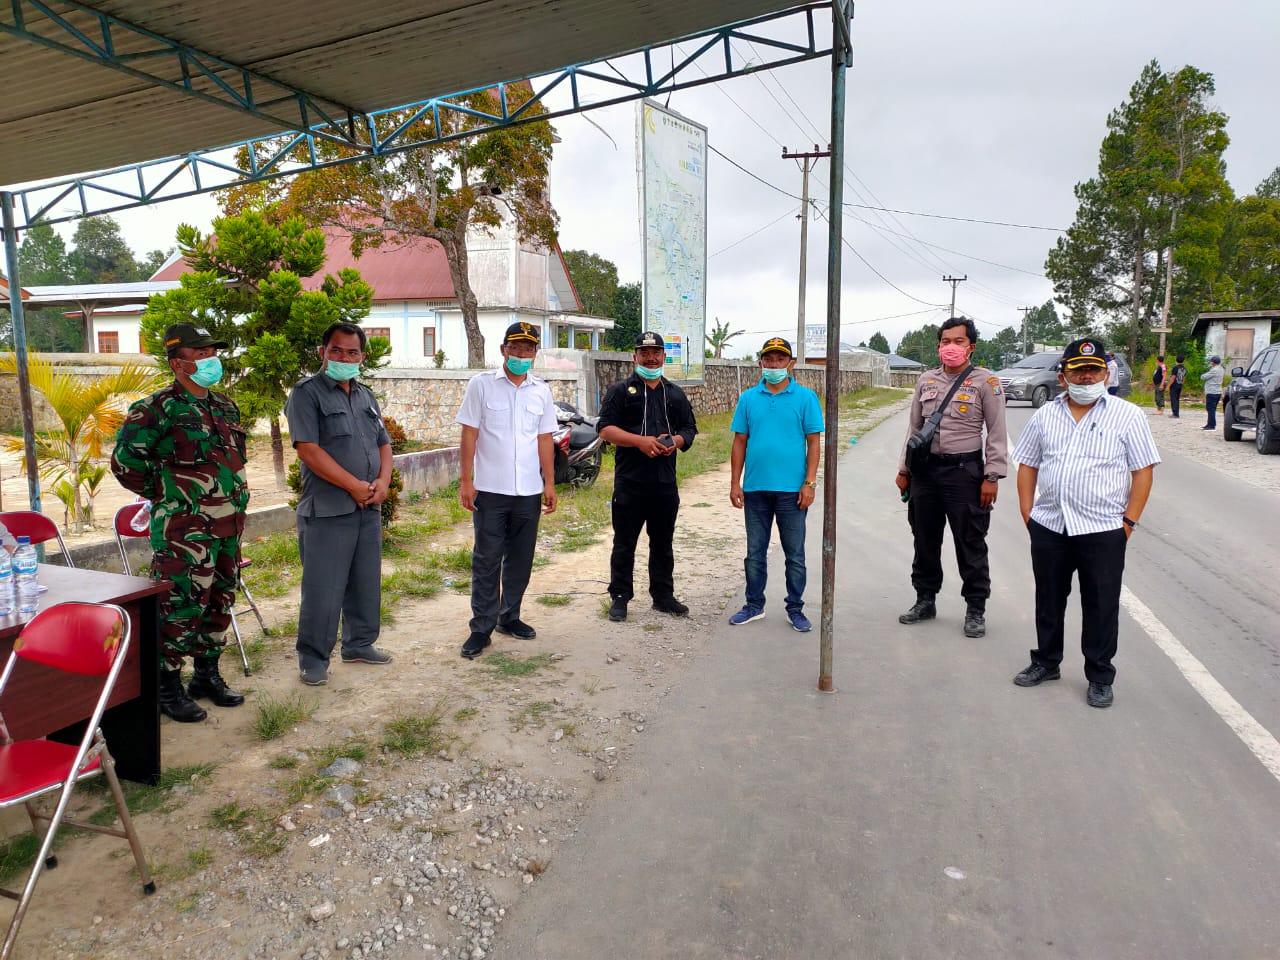 Kunjungan ke Posko 3 Siaga Covid-19 di Perbatasan Desa Hutajulu Kecamatan Pollung